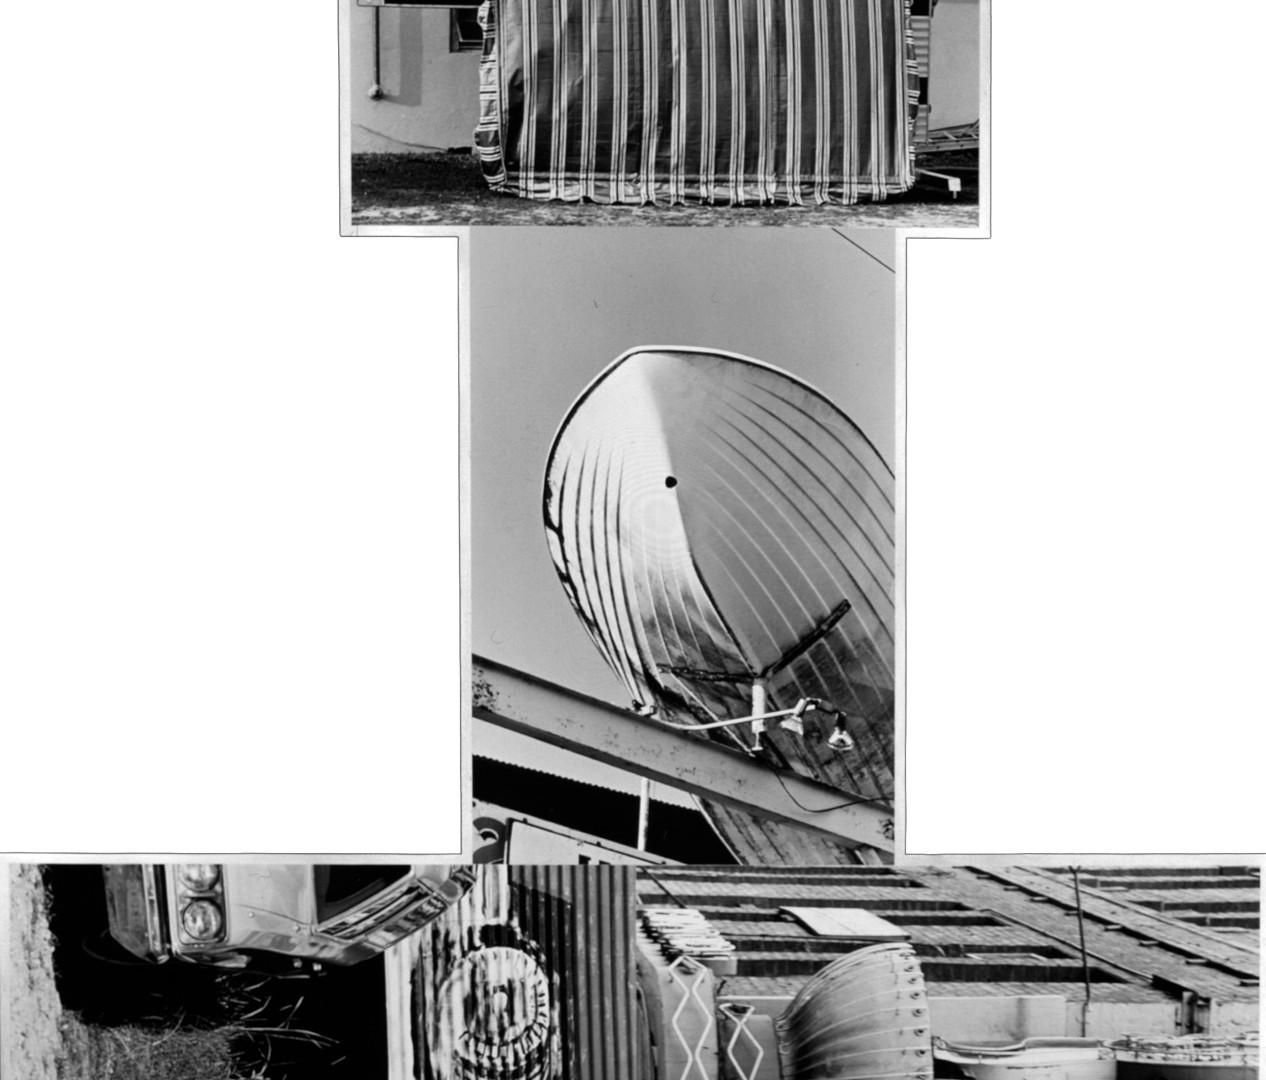 Robert Rauschenberg, Photem Series I #5, 1991